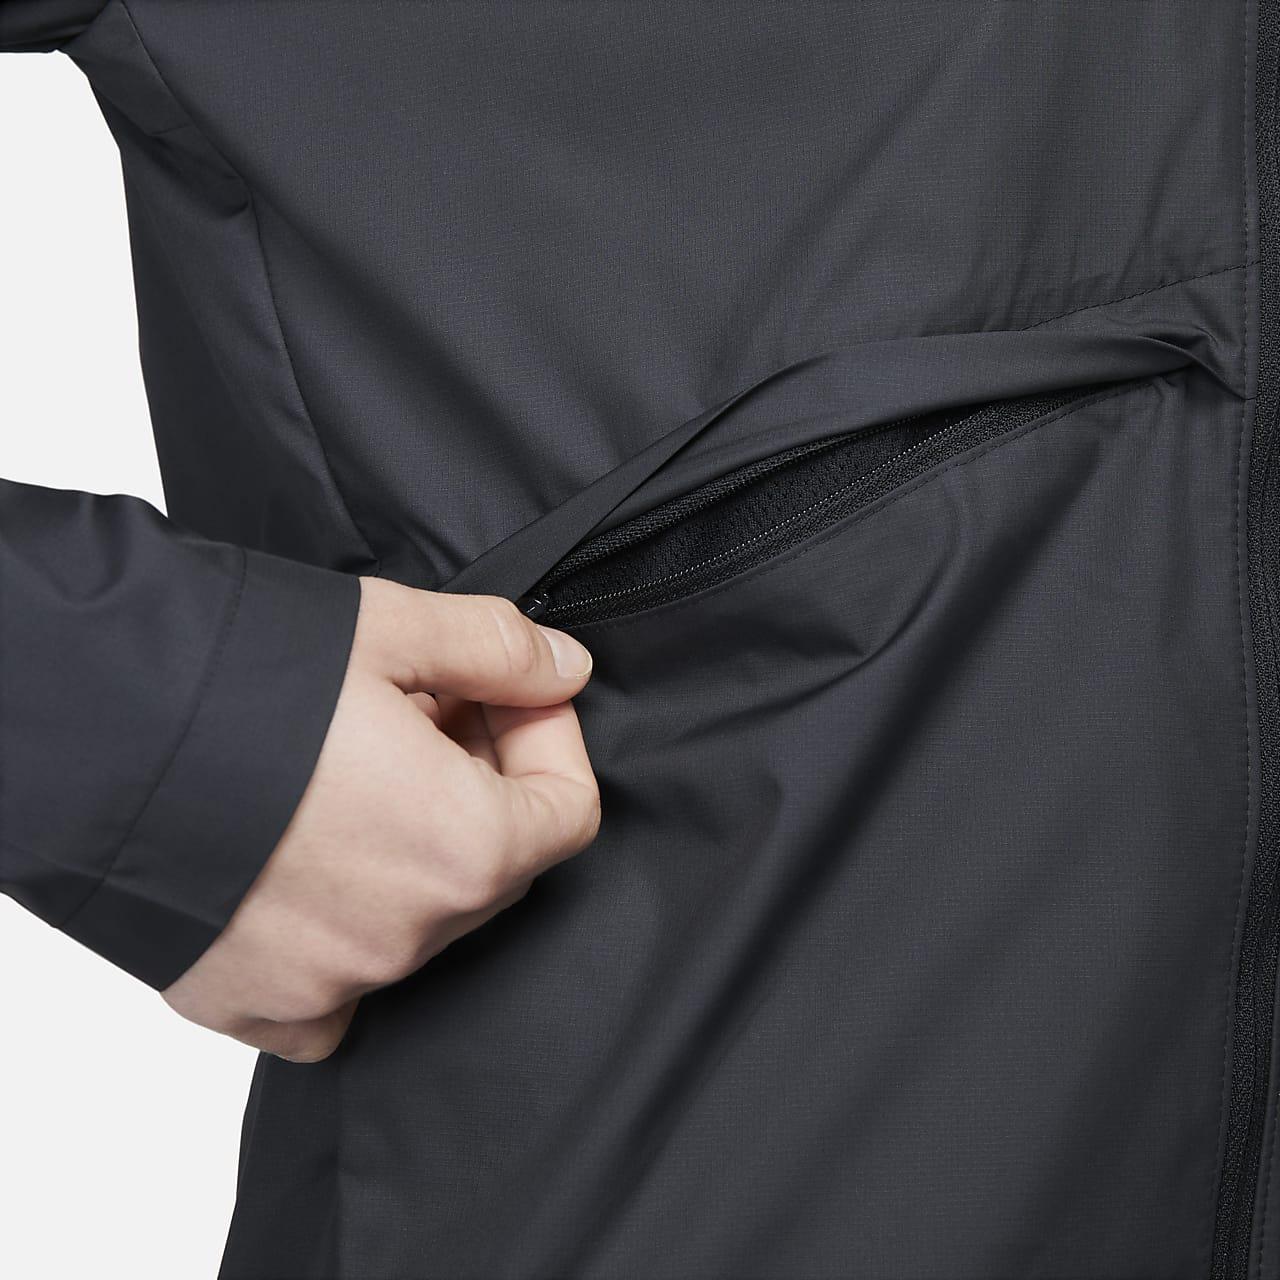 bcae771e0d08 Nike Essential Women s Packable Running Rain Jacket. Nike.com AU